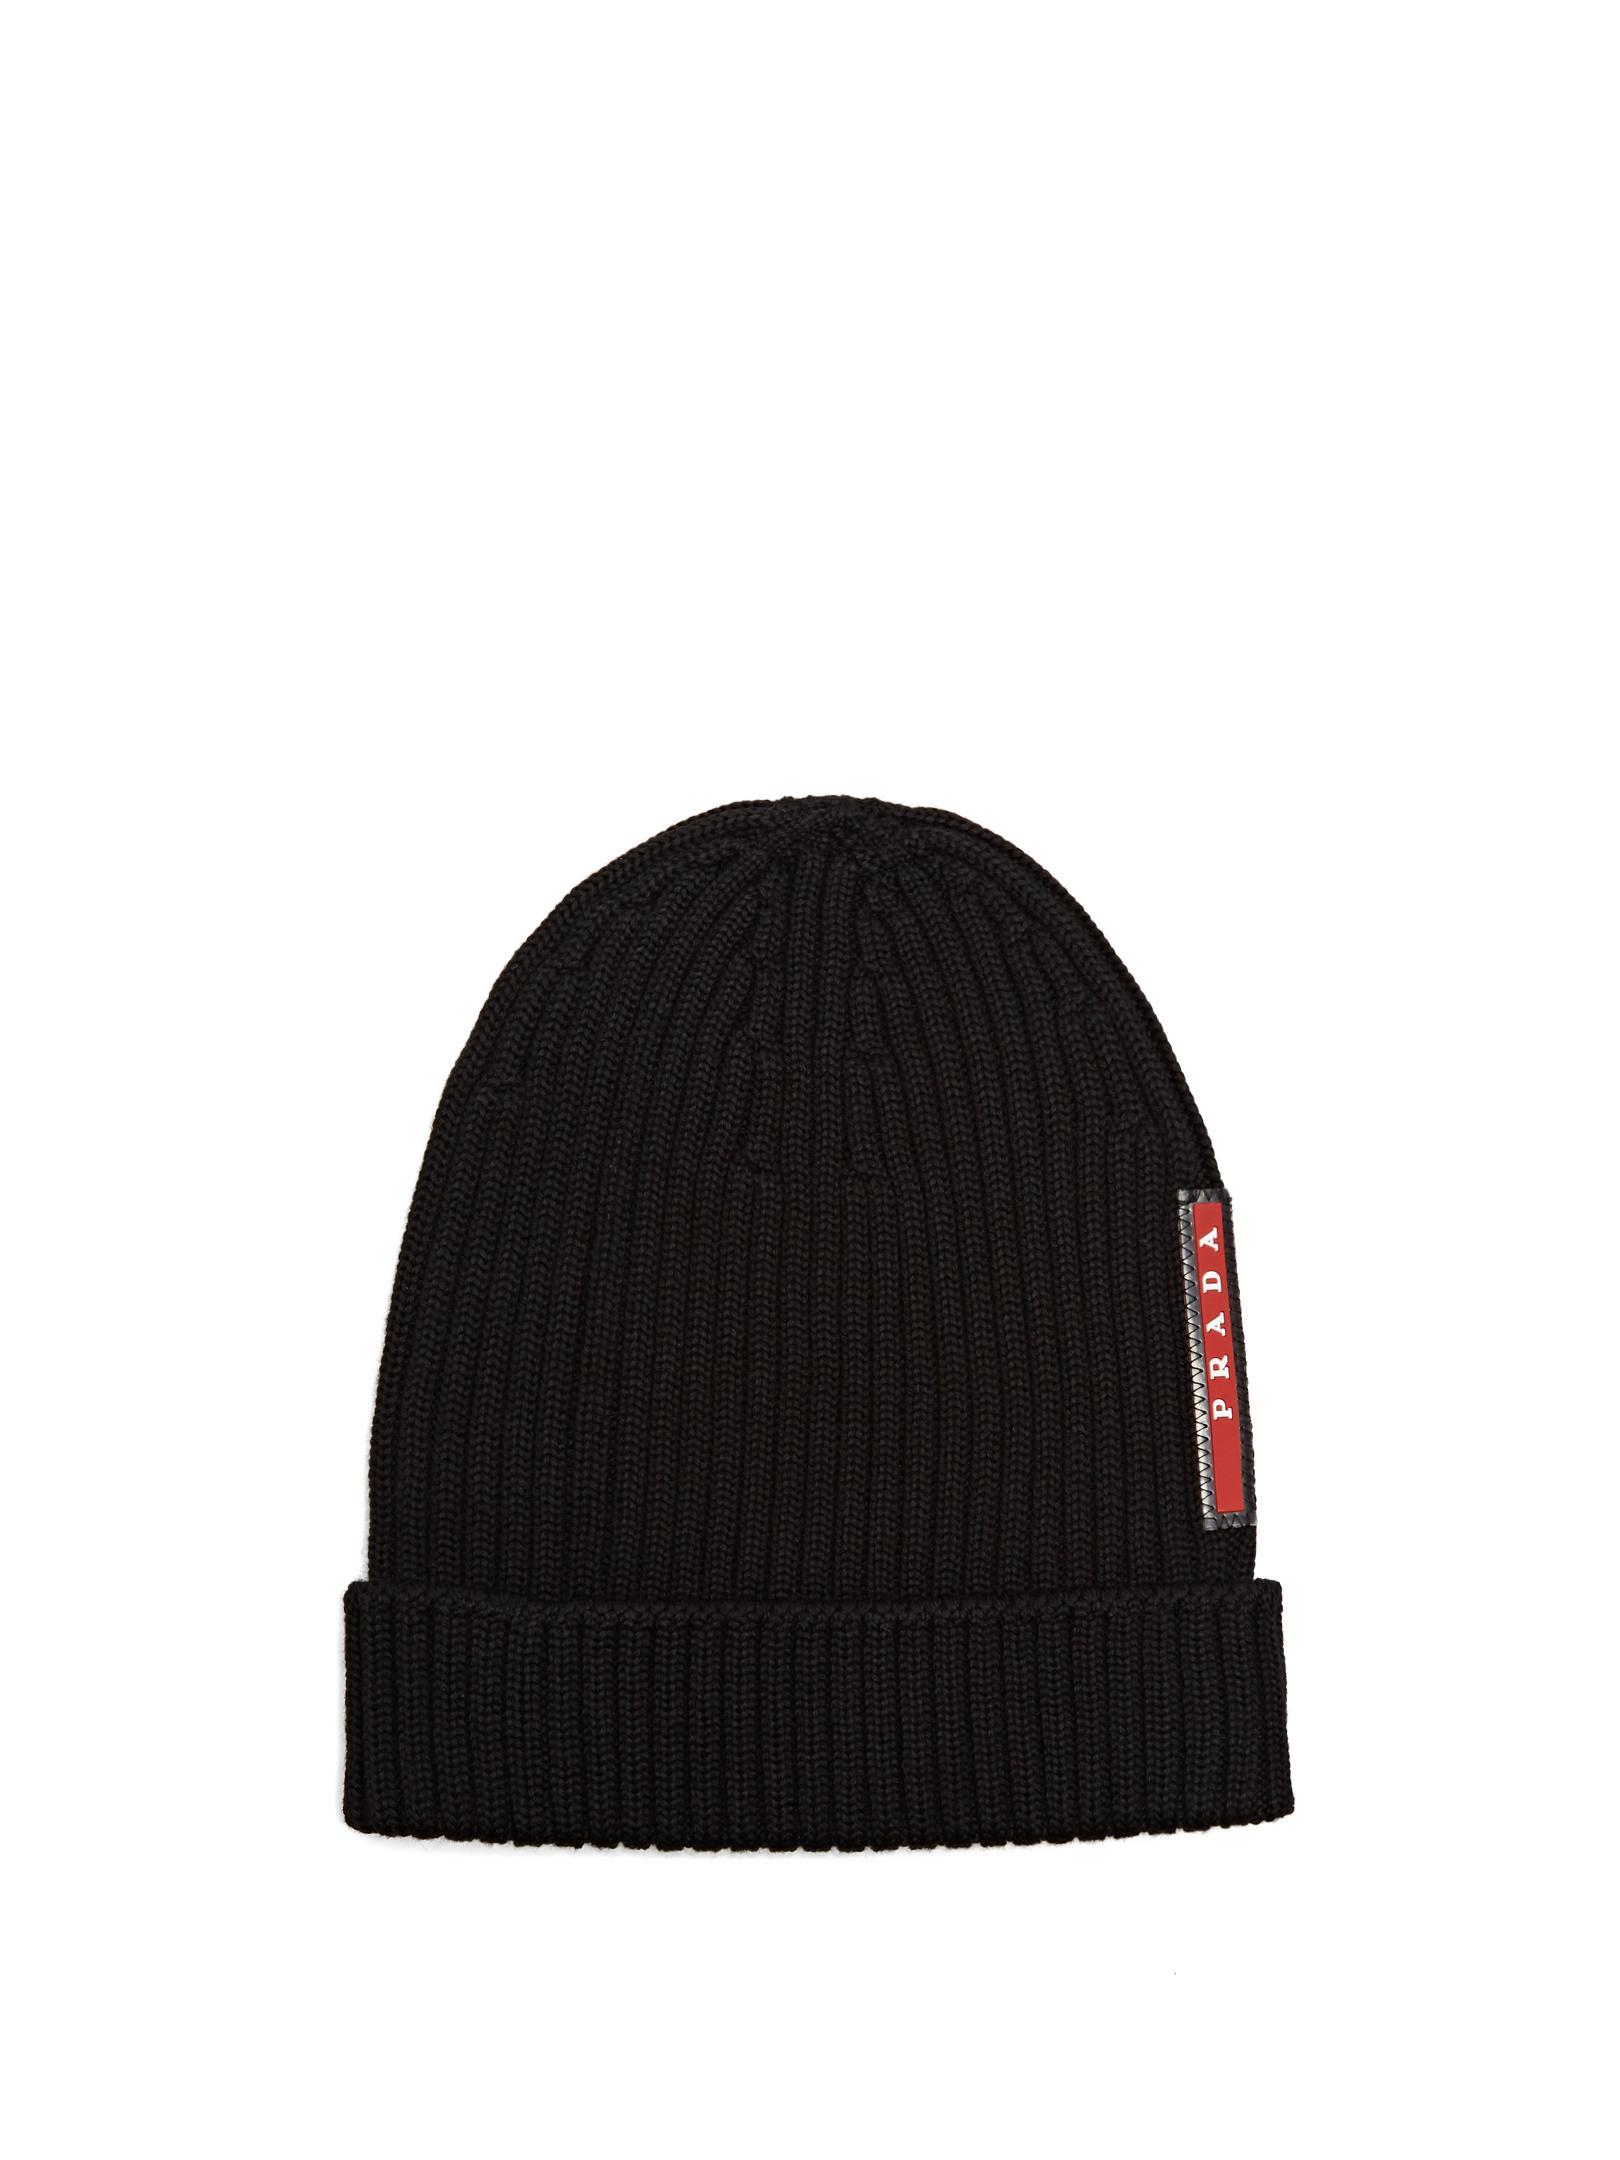 2377baf3e9284 Prada Ribbed-knit Beanie Hat in Black for Men - Lyst